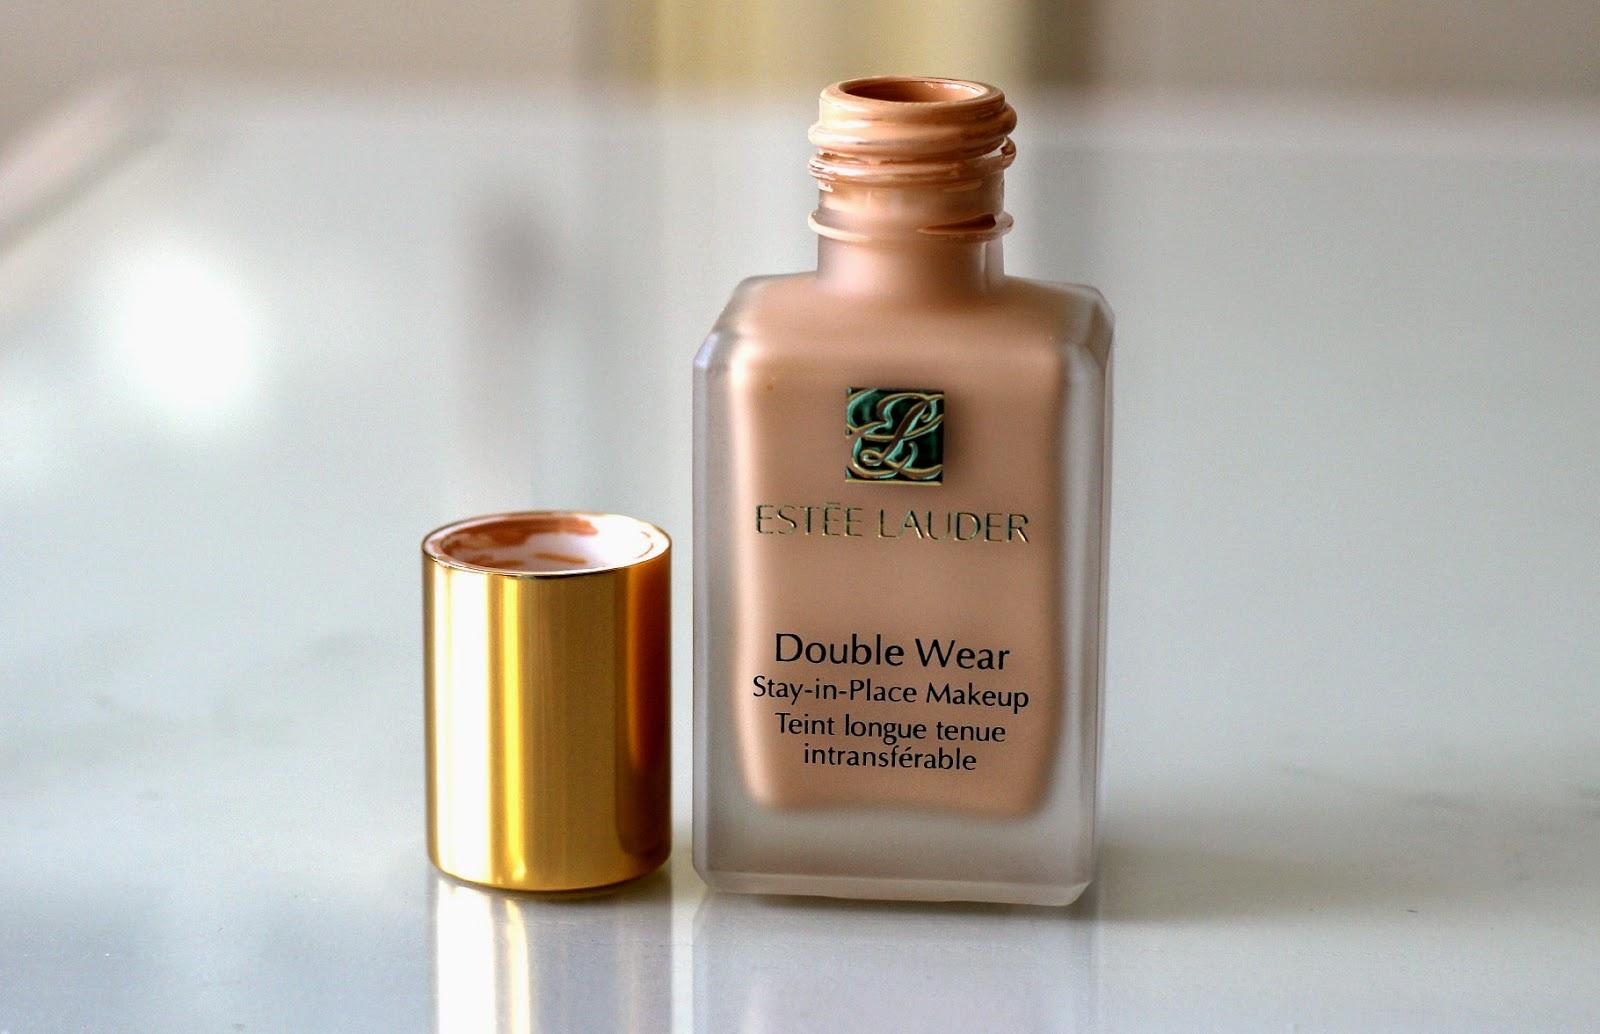 est e lauder double wear stay in place makeup foundation. Black Bedroom Furniture Sets. Home Design Ideas